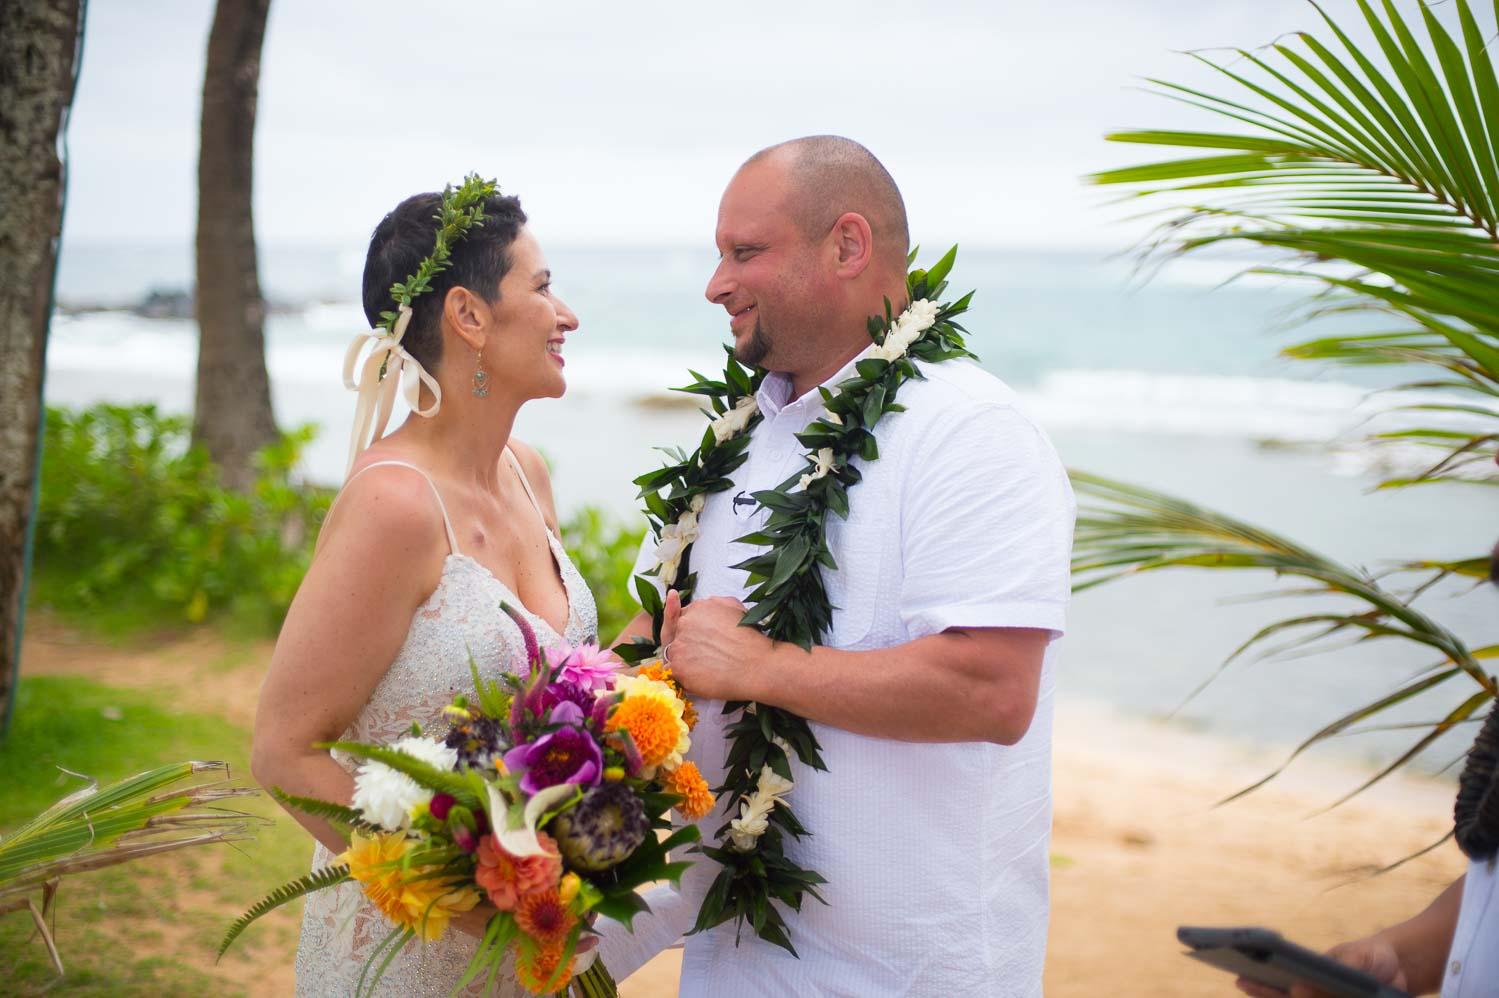 maui-wedding-photography-maui-wedding-venue-Tad-Craig-Photography-18.jpg